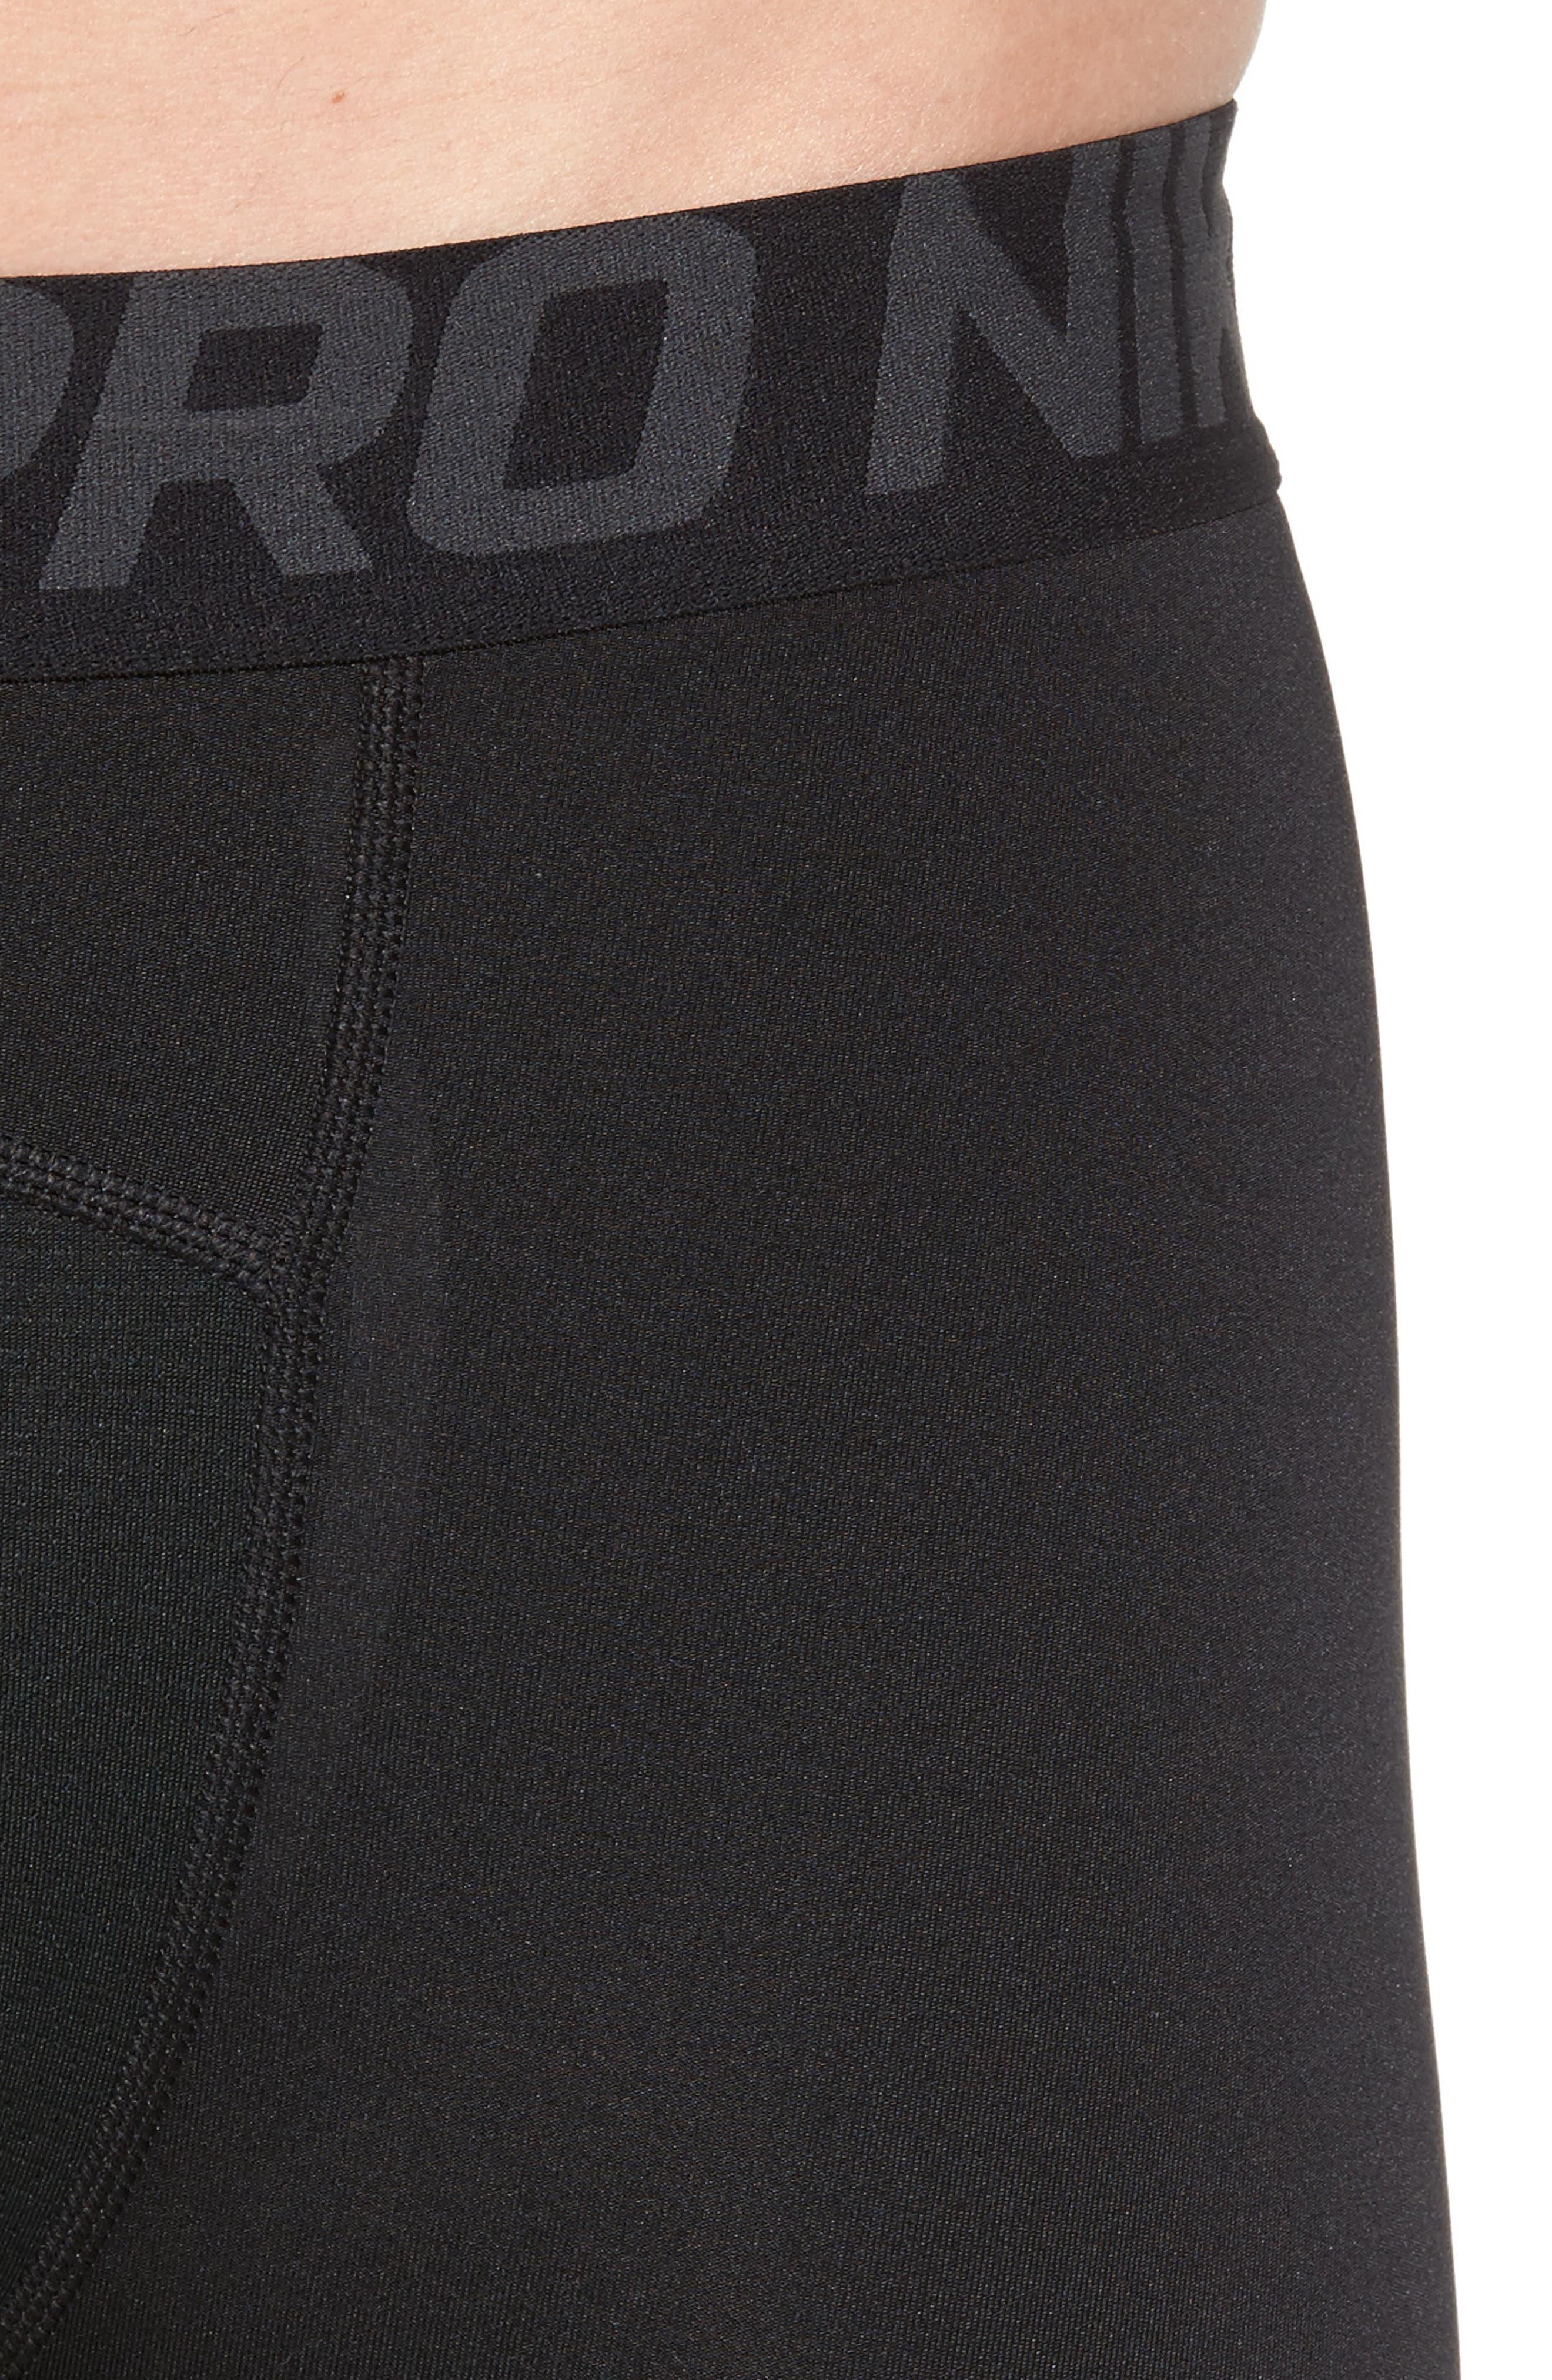 Alternate Image 3  - Nike Pro Three Quarter Training Tights